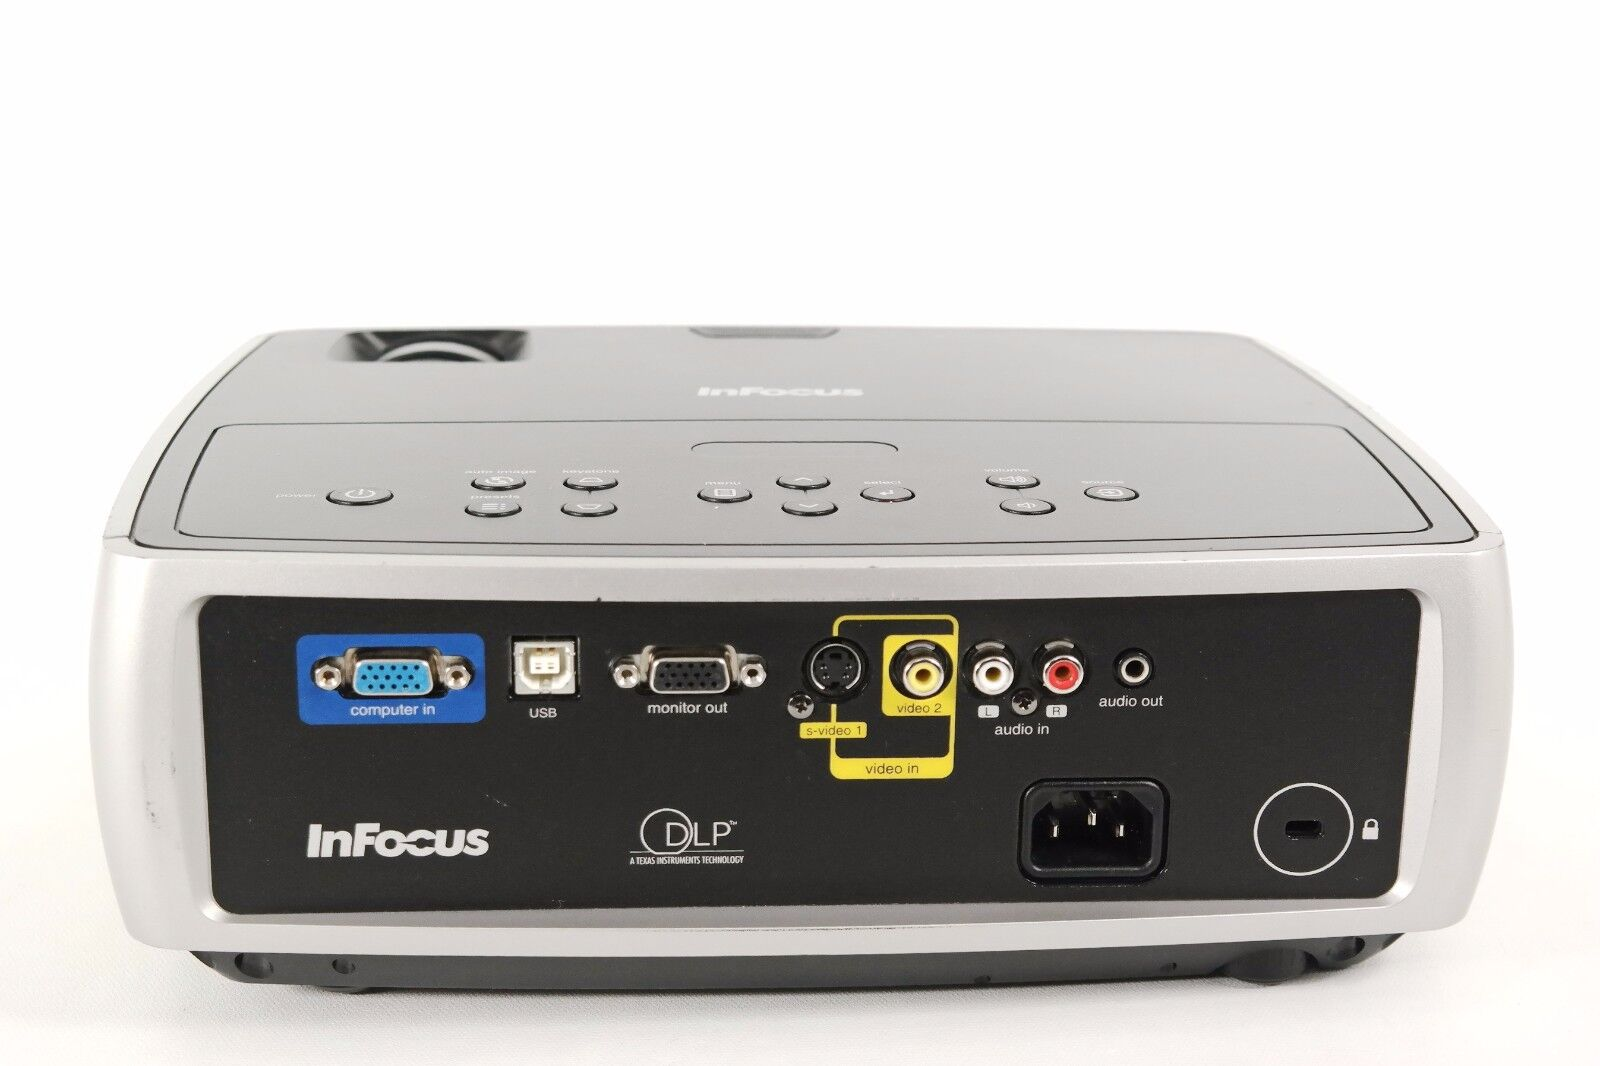 infocus work big in24 dlp projector ebay rh ebay com Infocus Projector W240 Infocus Projectors Amazon